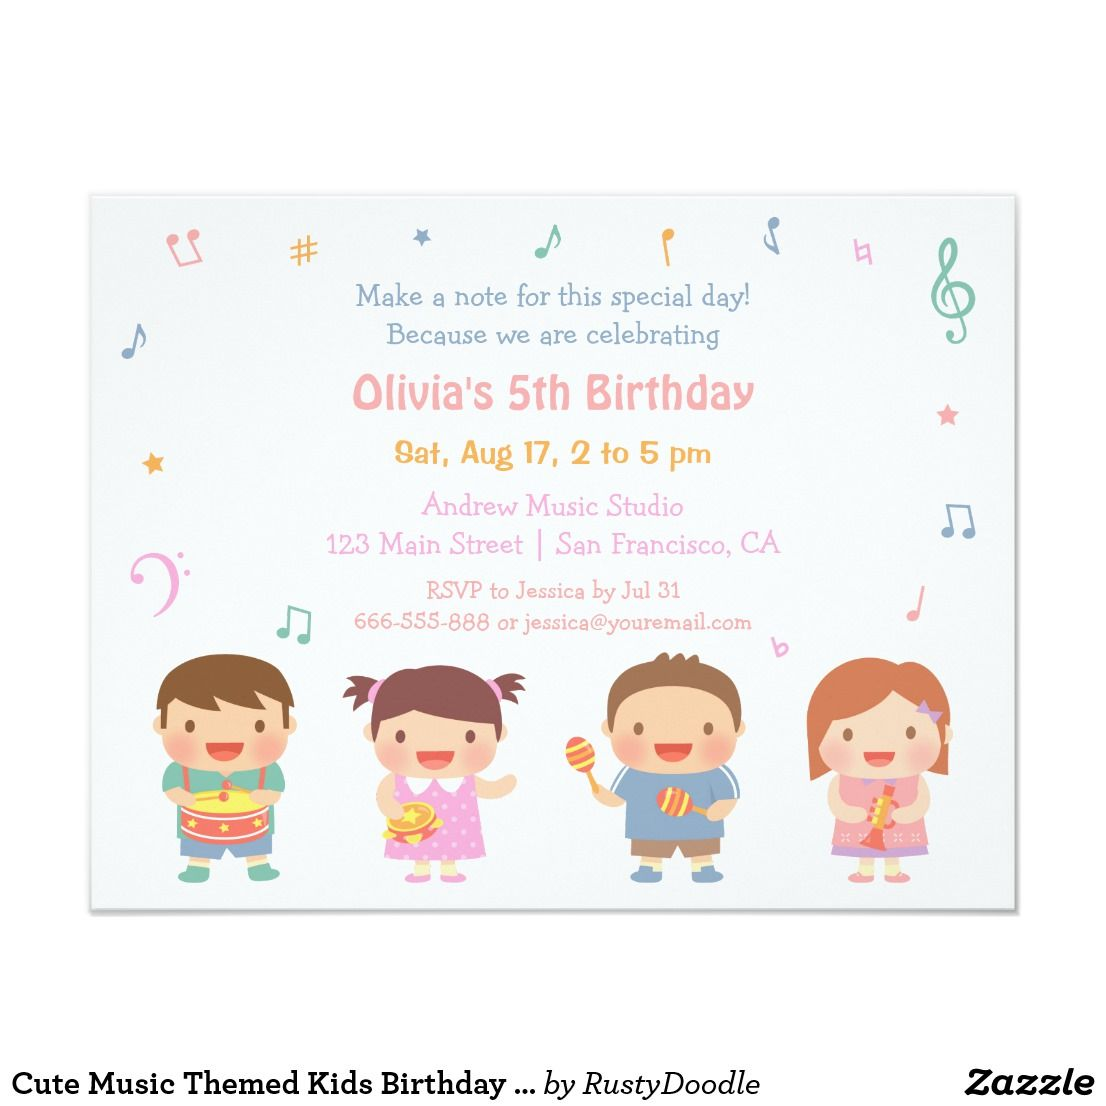 Cute Music Themed Kids Birthday Party Invitations   Kids birthday ...